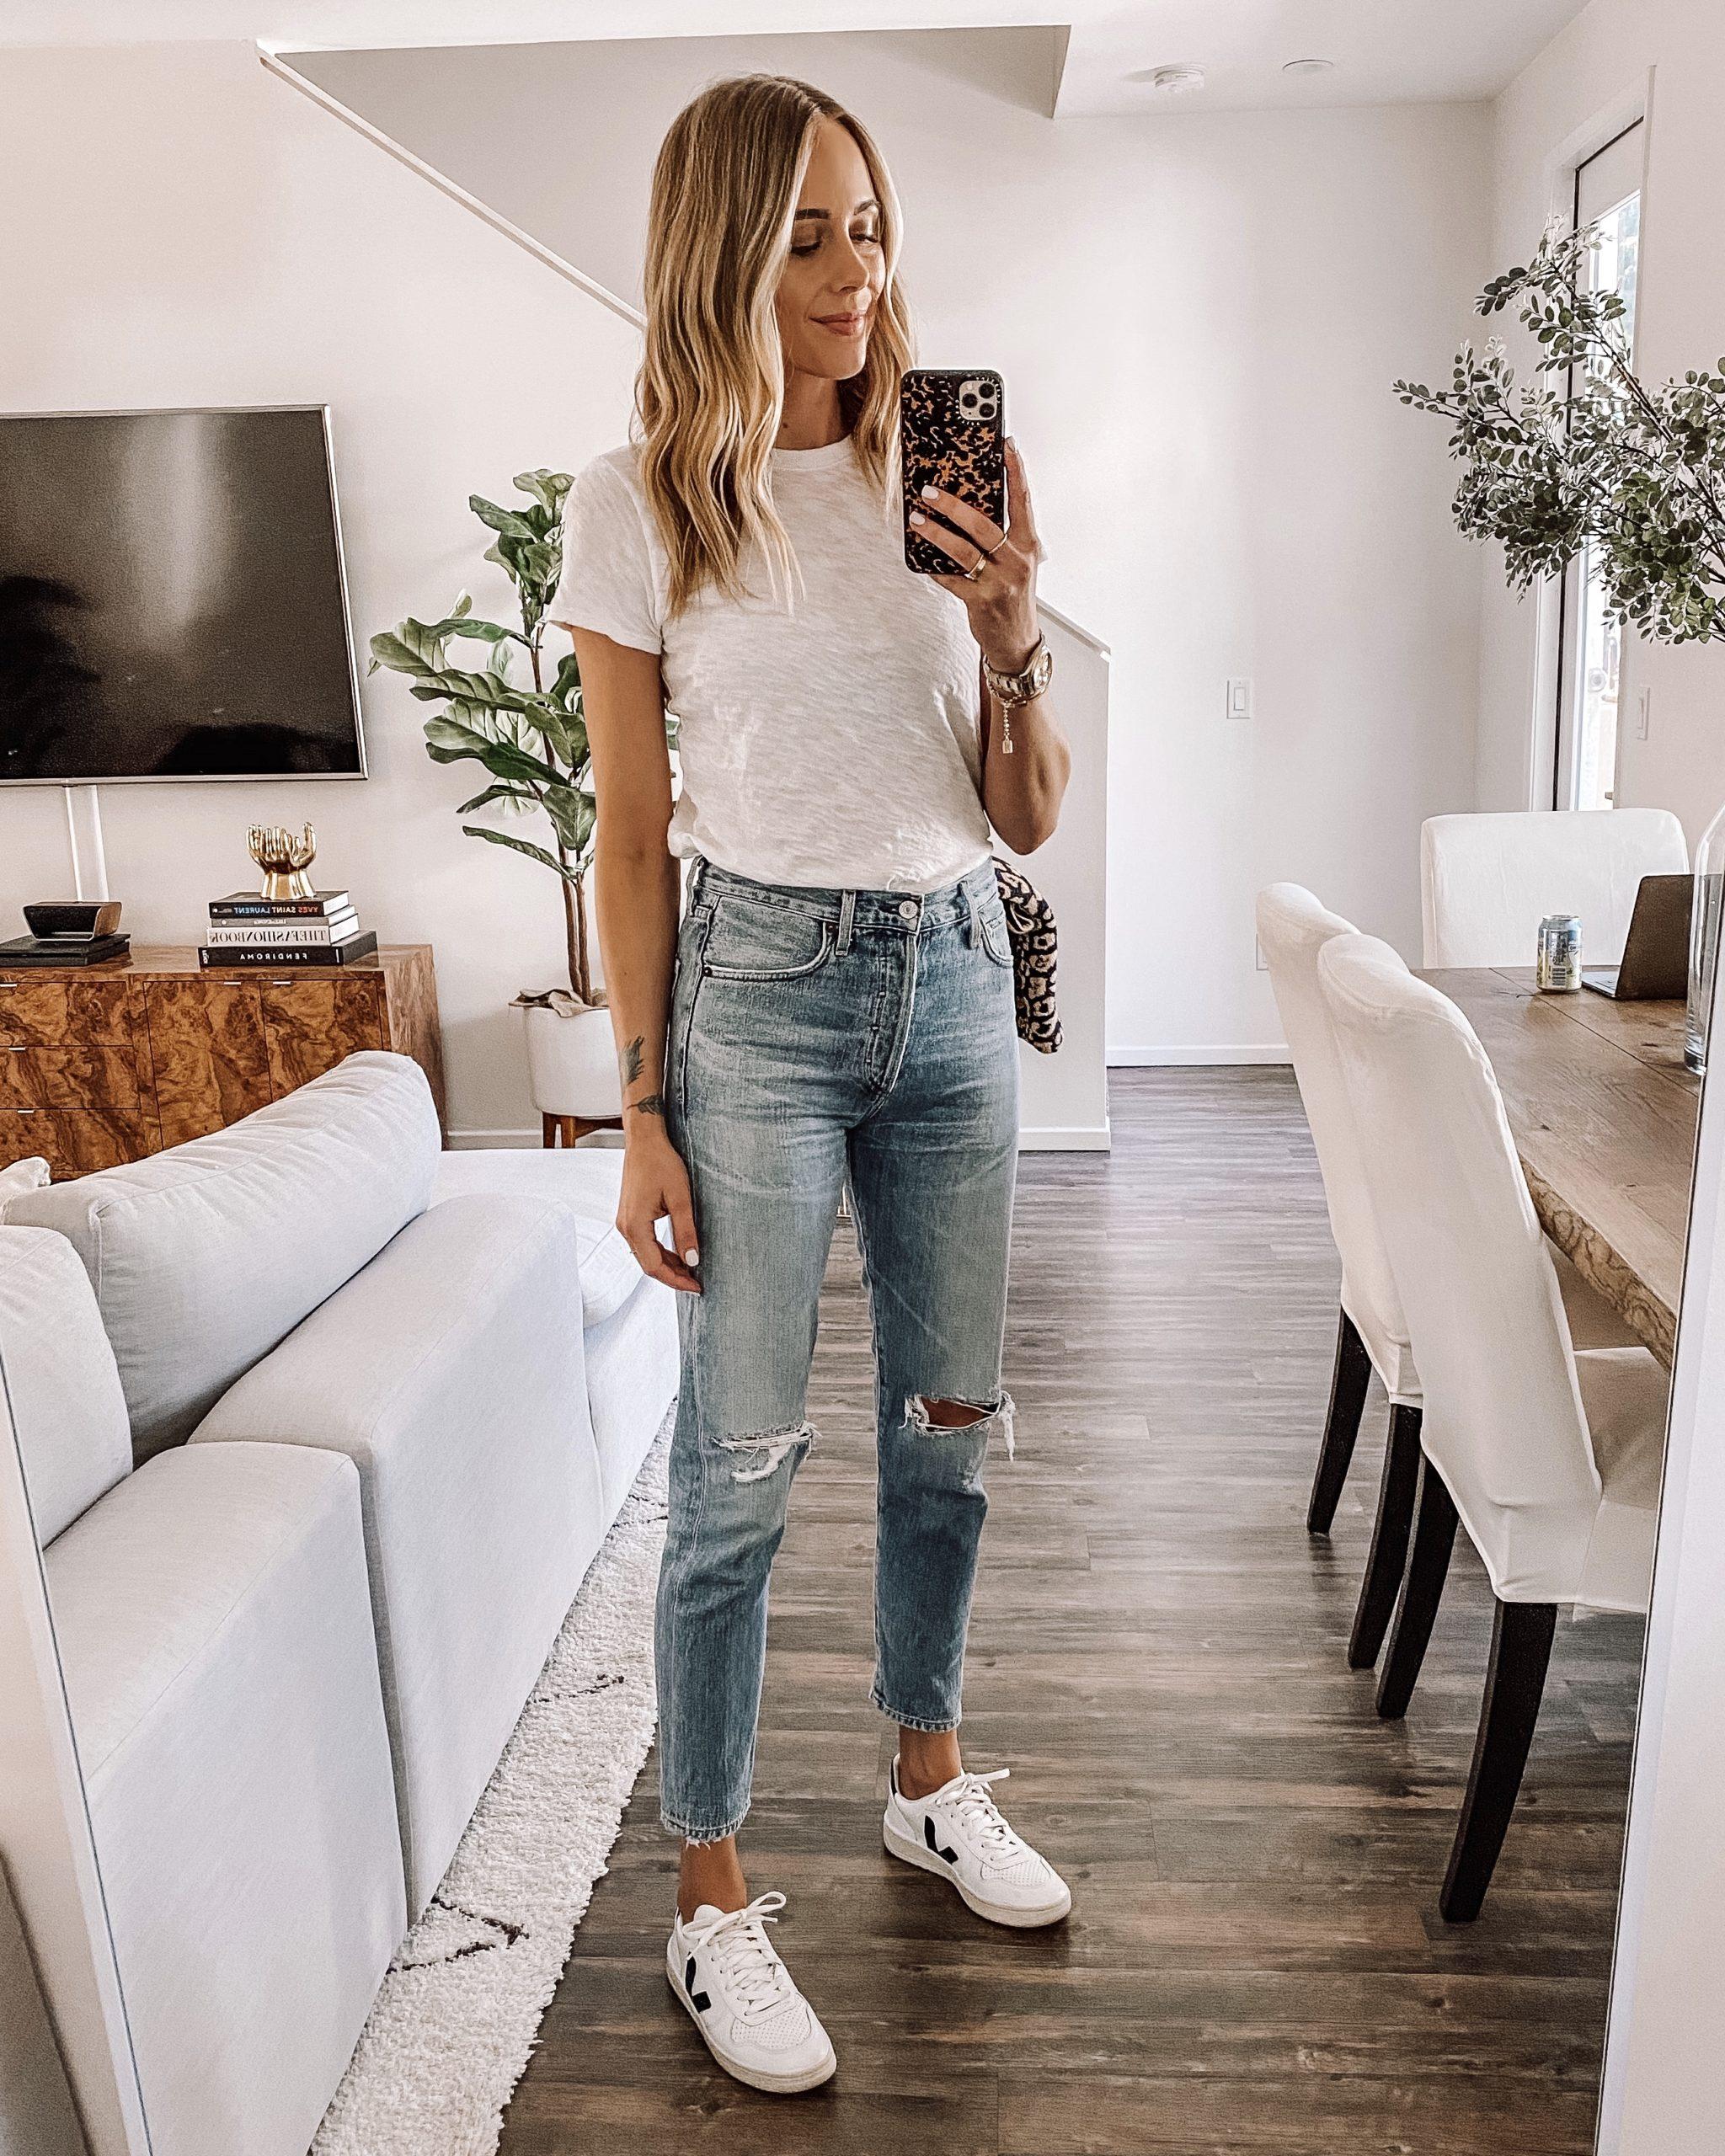 Fashion Jackson Wearing White Tshirt Ripped Jeans